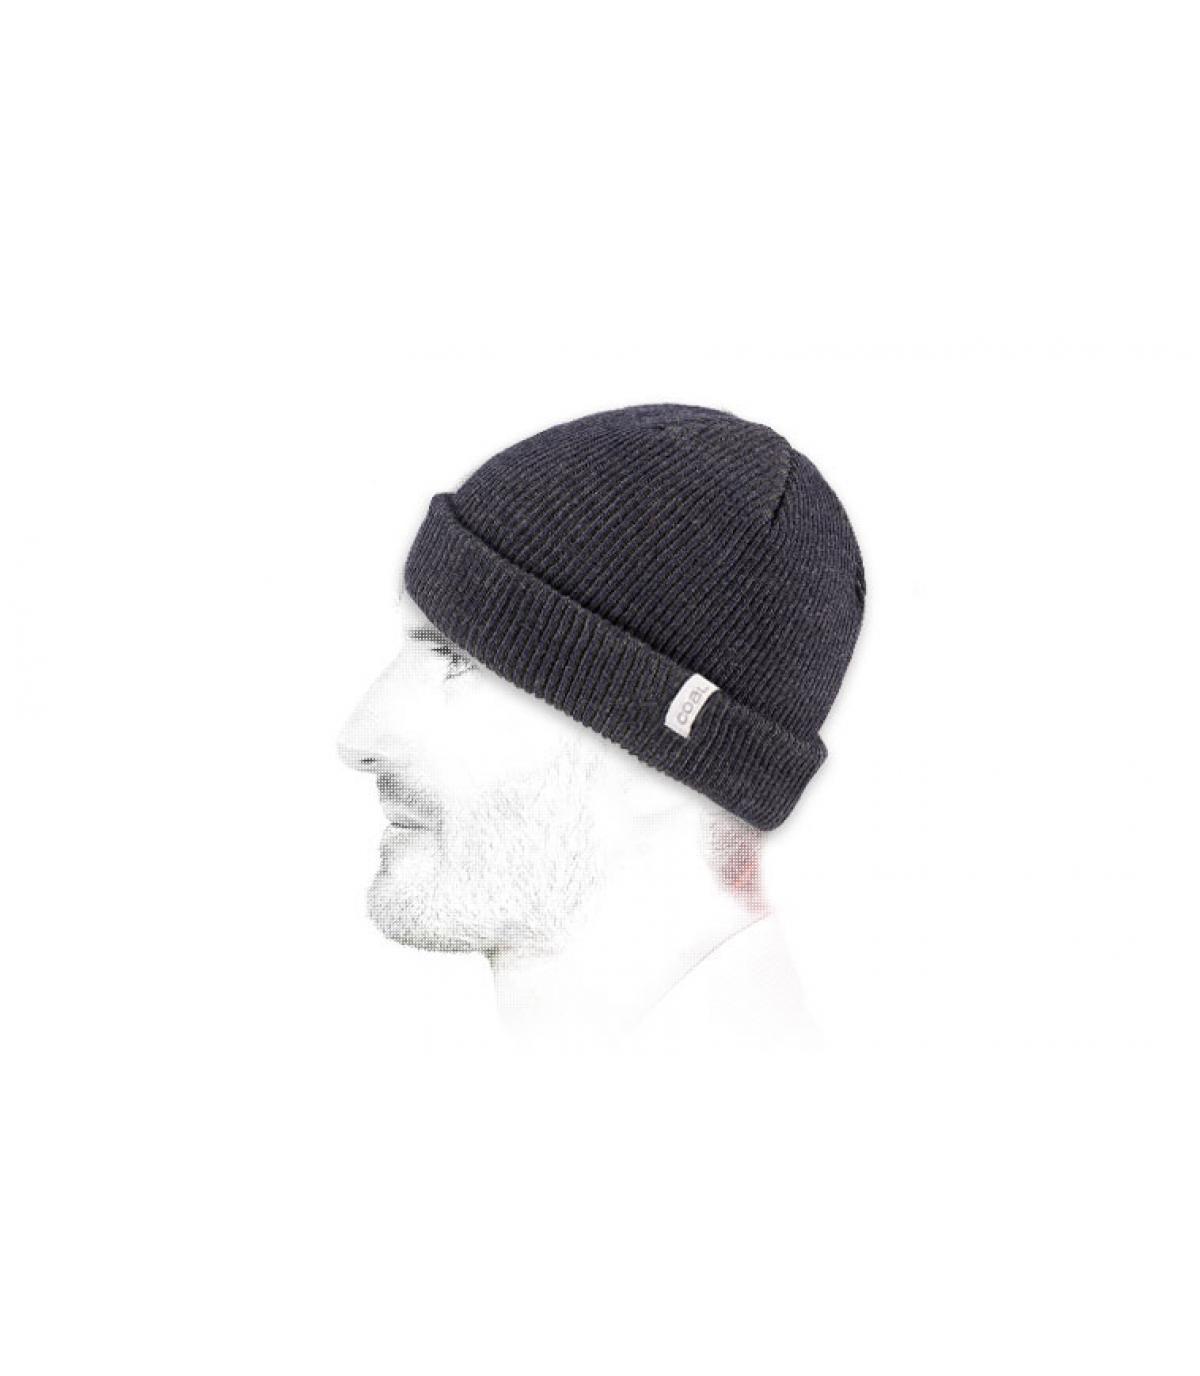 Mütze Rand marineblau kurz Beanie